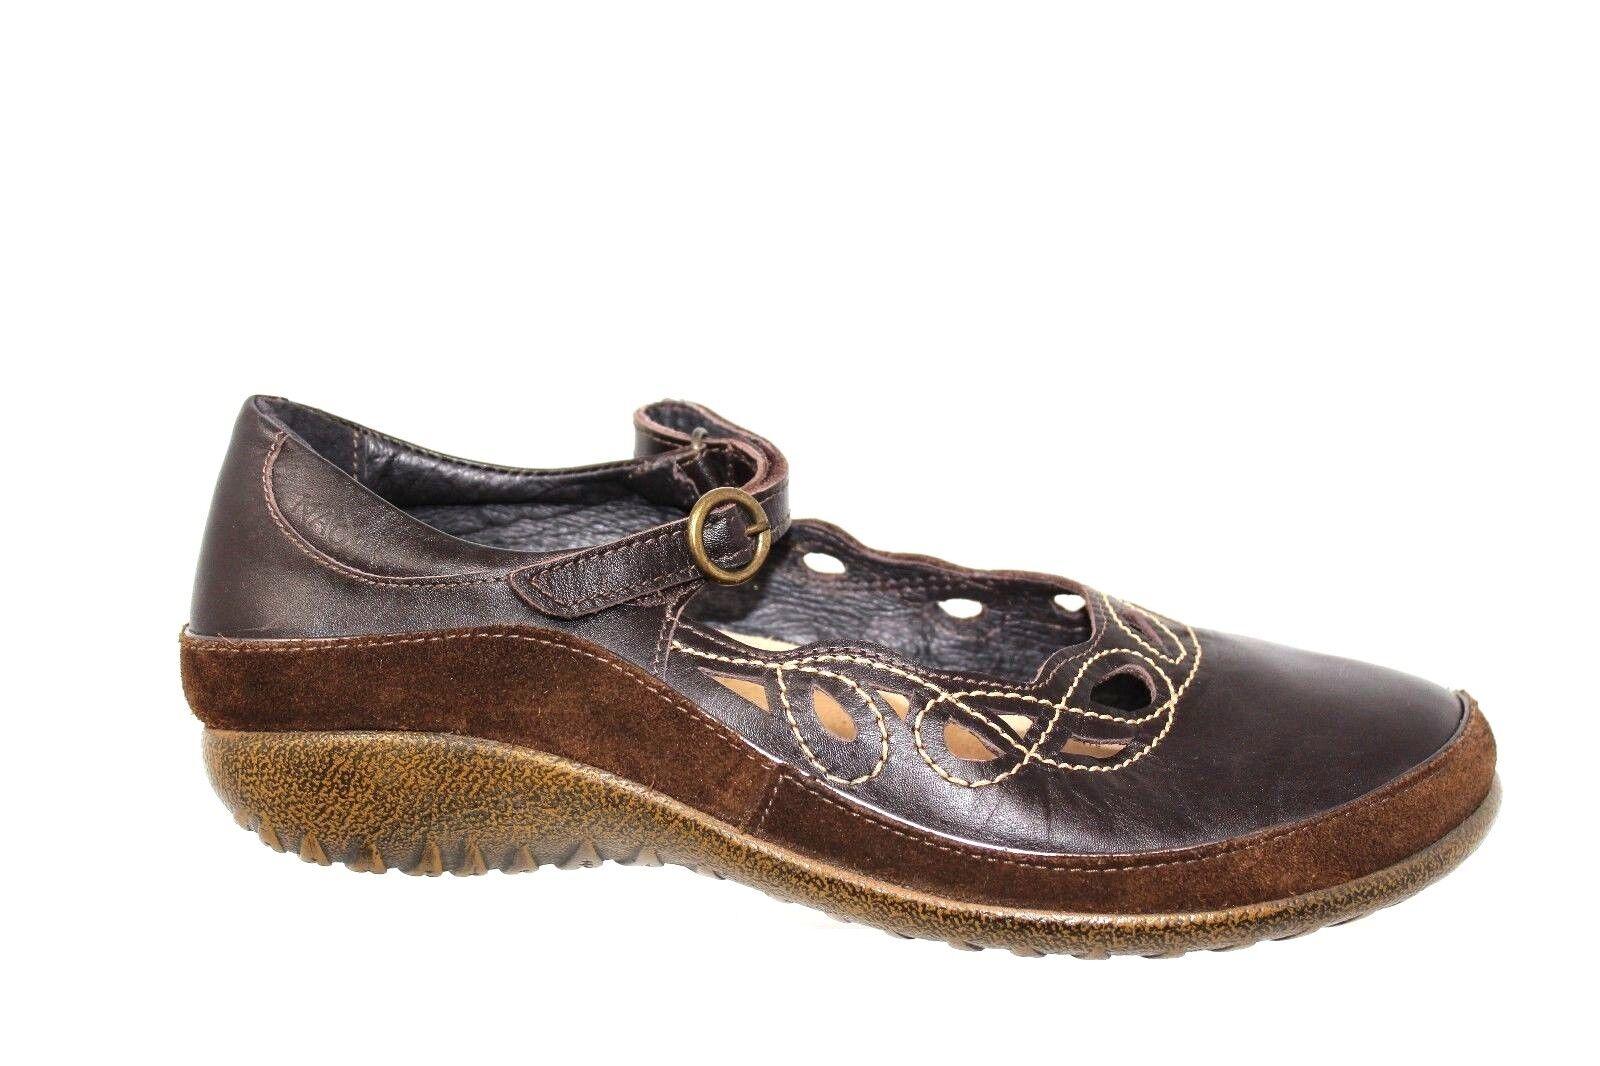 fabbrica diretta Naot Rahina Cut Out Marrone Leather Mary Jane scarpe scarpe scarpe Dimensione EU 40 US 9 9.5  ti renderà soddisfatto